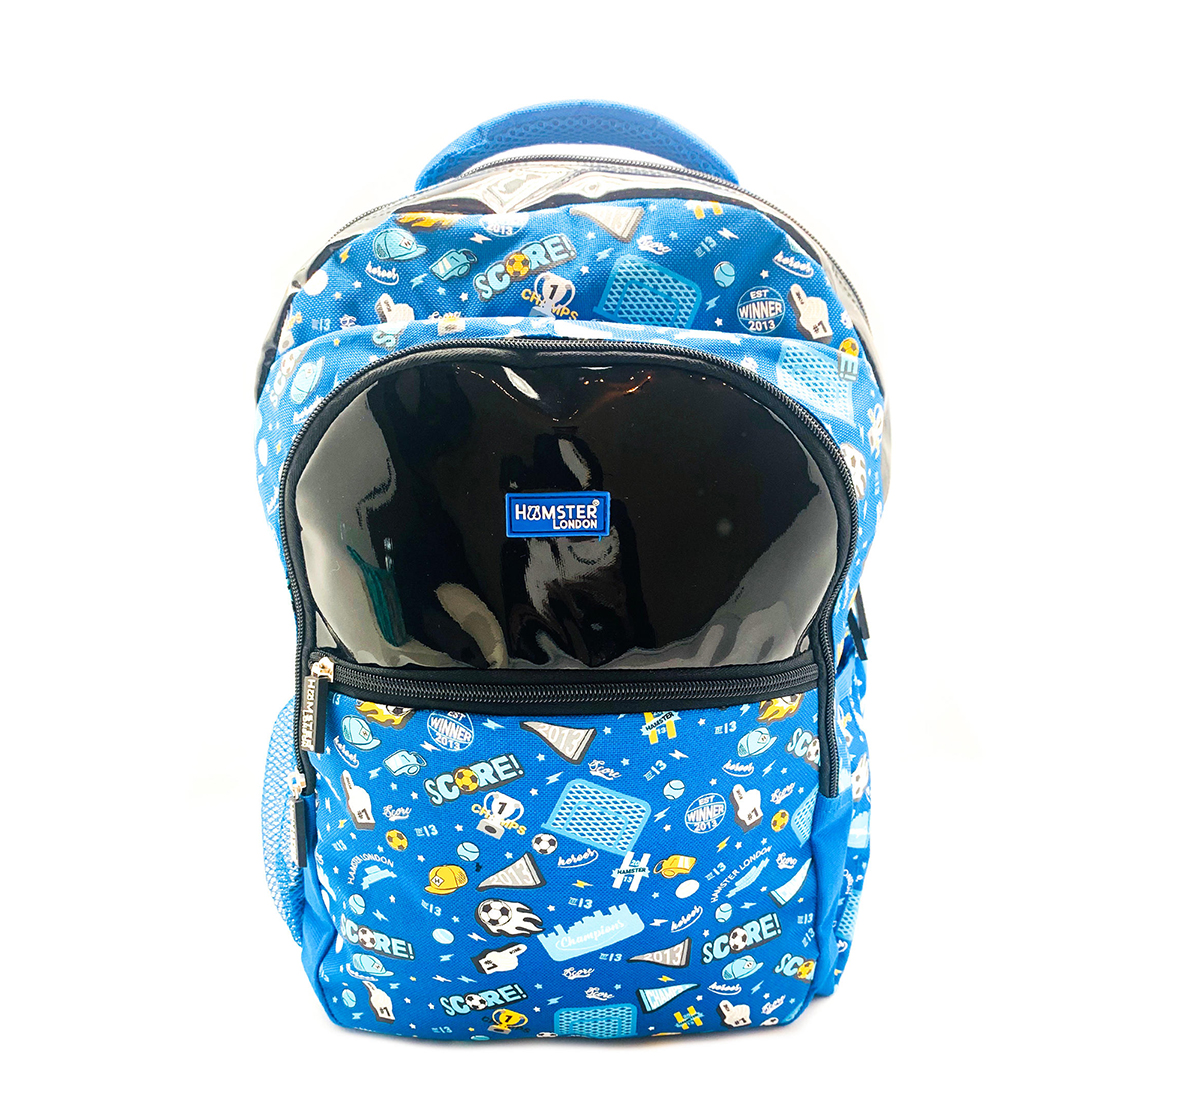 Hamster London | Hamster London Soccer Theme Big Backpack for Boys age 3Y+ (Blue)